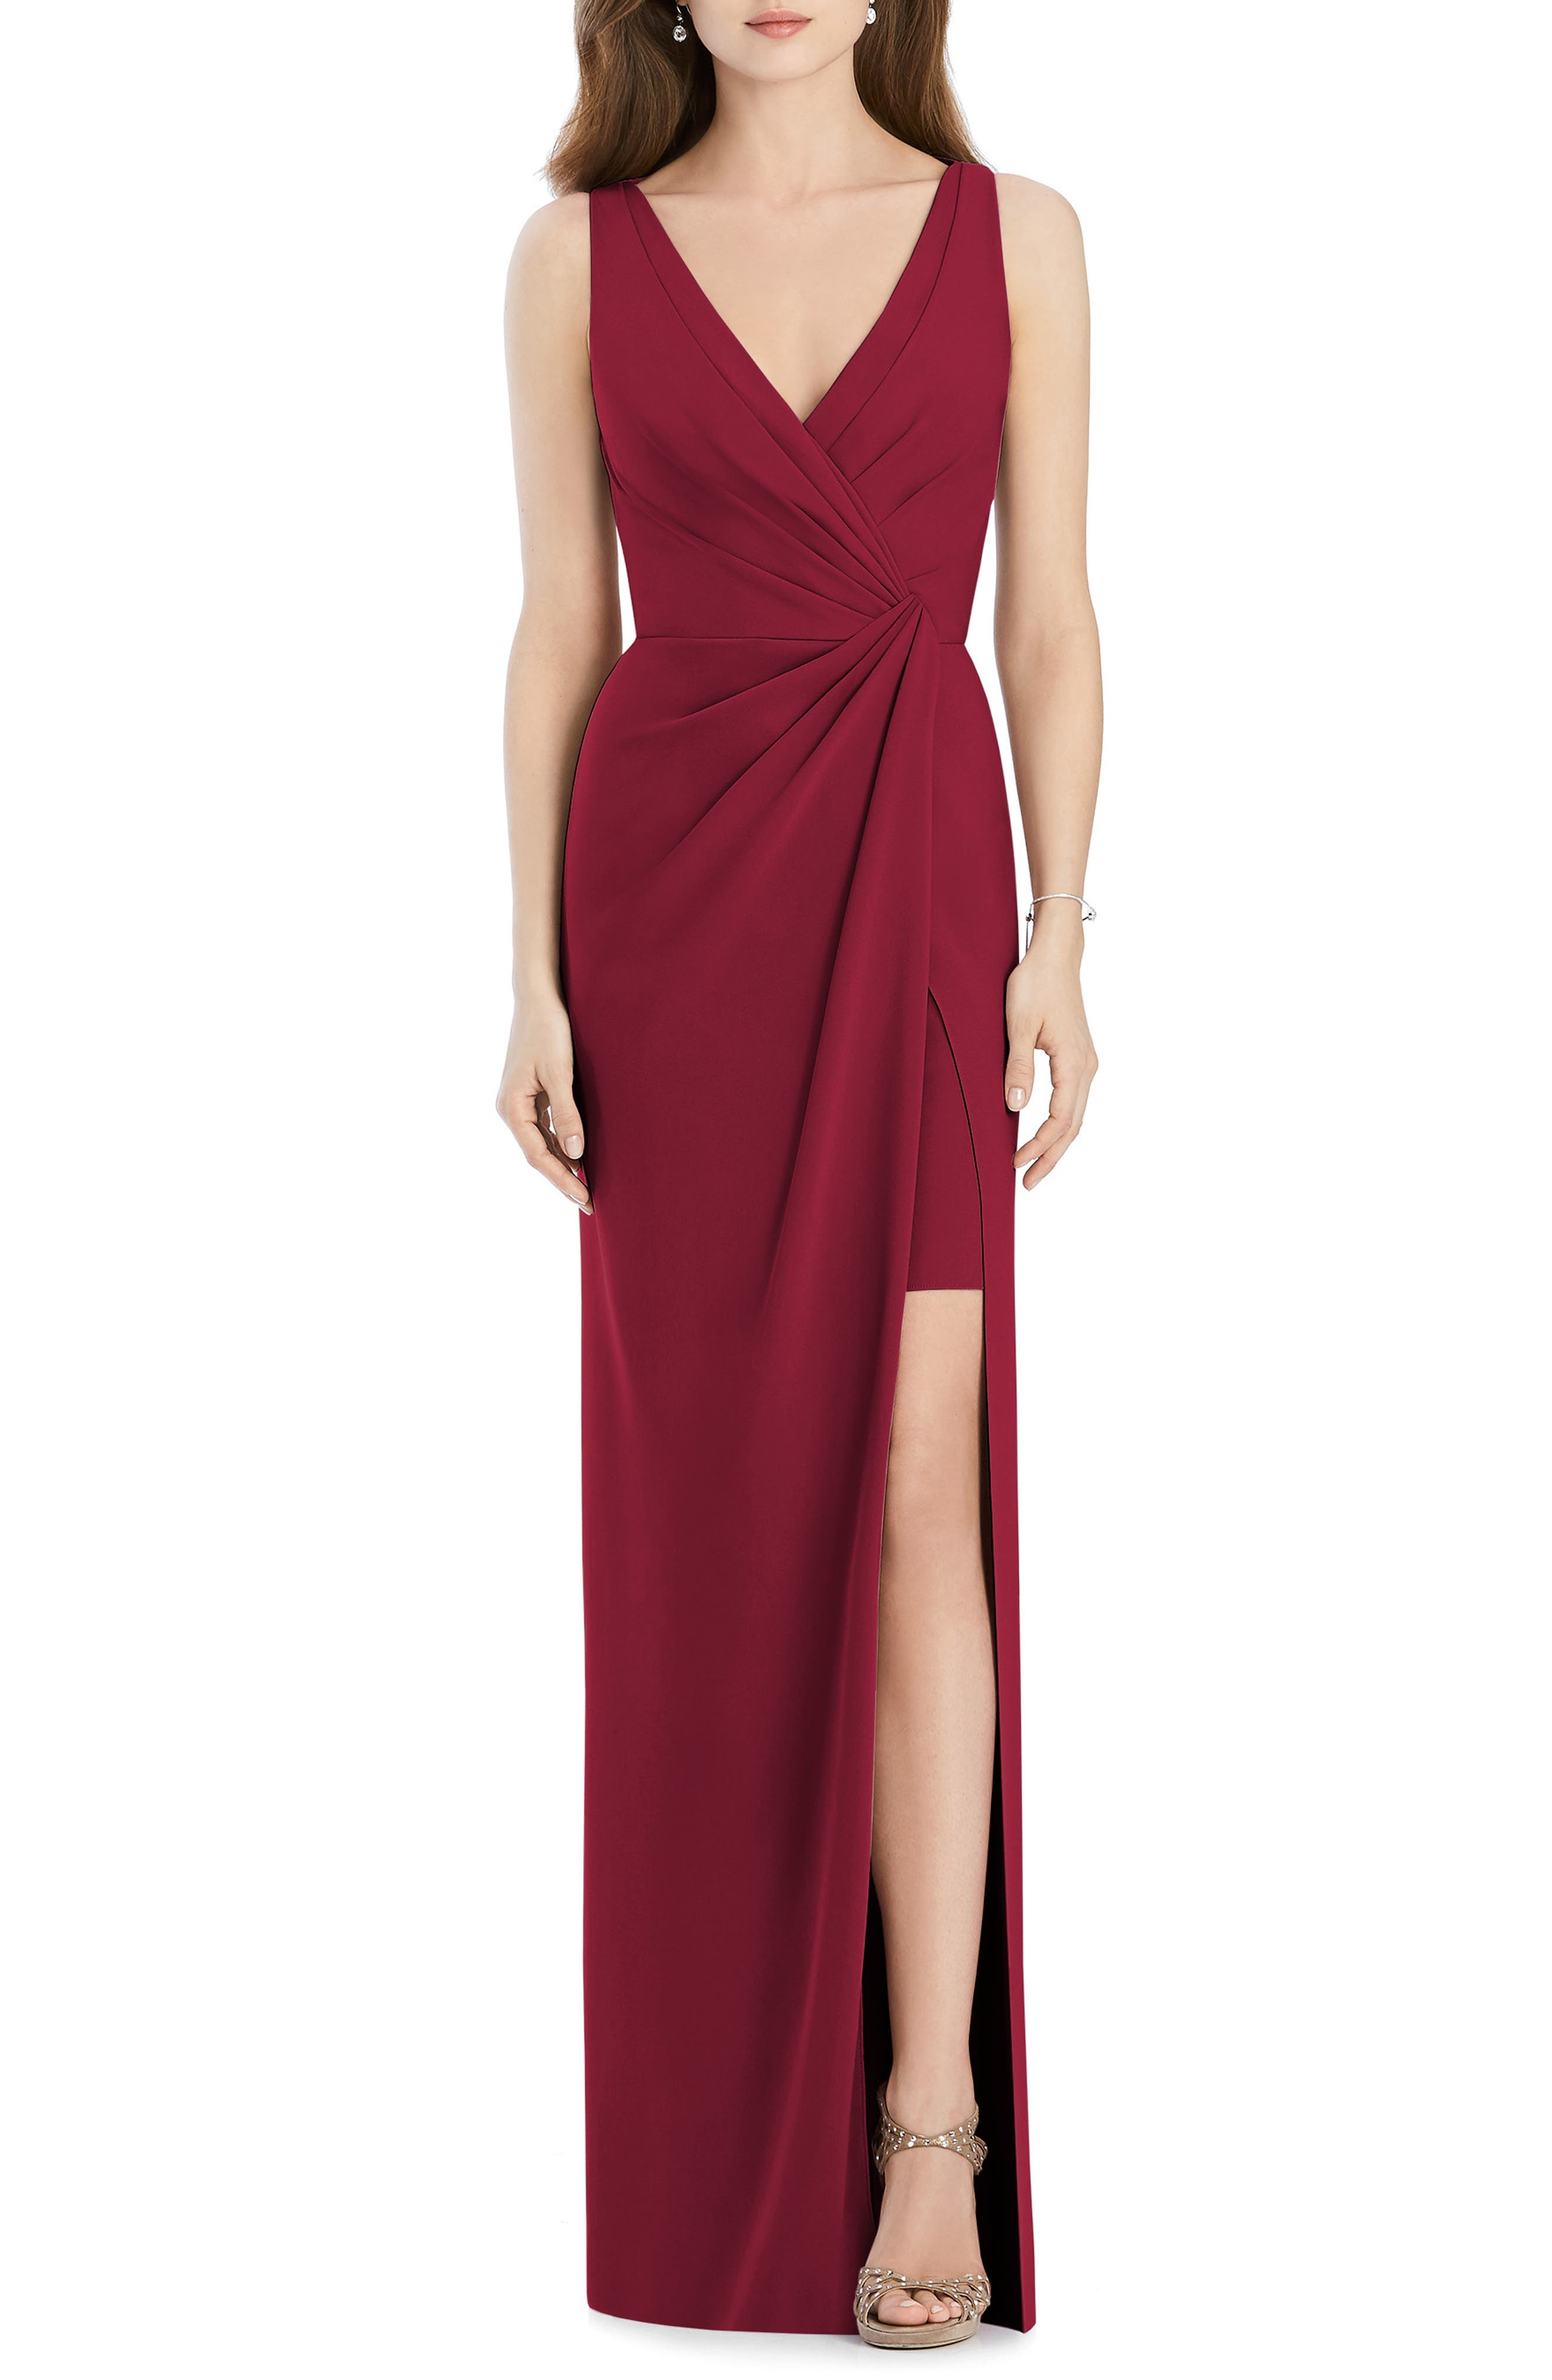 Jenny Packham Crepe Column Gown, Burgundy